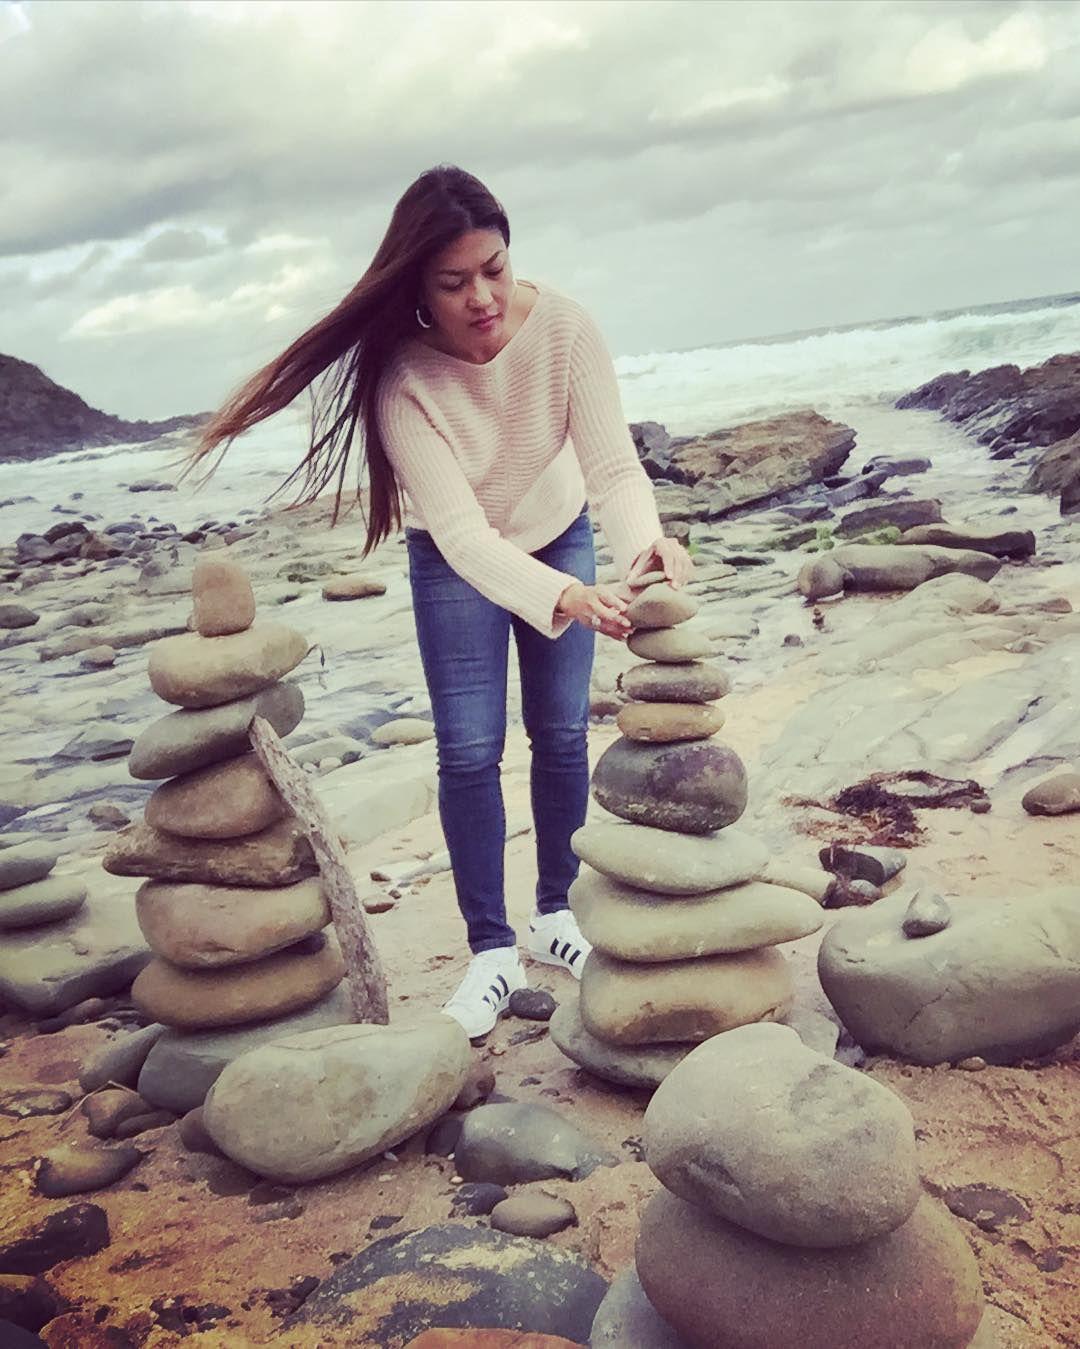 Stone stacking #carisbrook #carisbrookcreek  #greatoceanroad #greatoceanview #greatoceanroadtrip #greatoceanroadadventure #roadtrip #adventure #visitmelbourne #melbournesights #melbonpix #ilovemelbourne #wandervictoria #melbourne #stone #stonestack #stonestacking #cantileverbridge by sexyrax